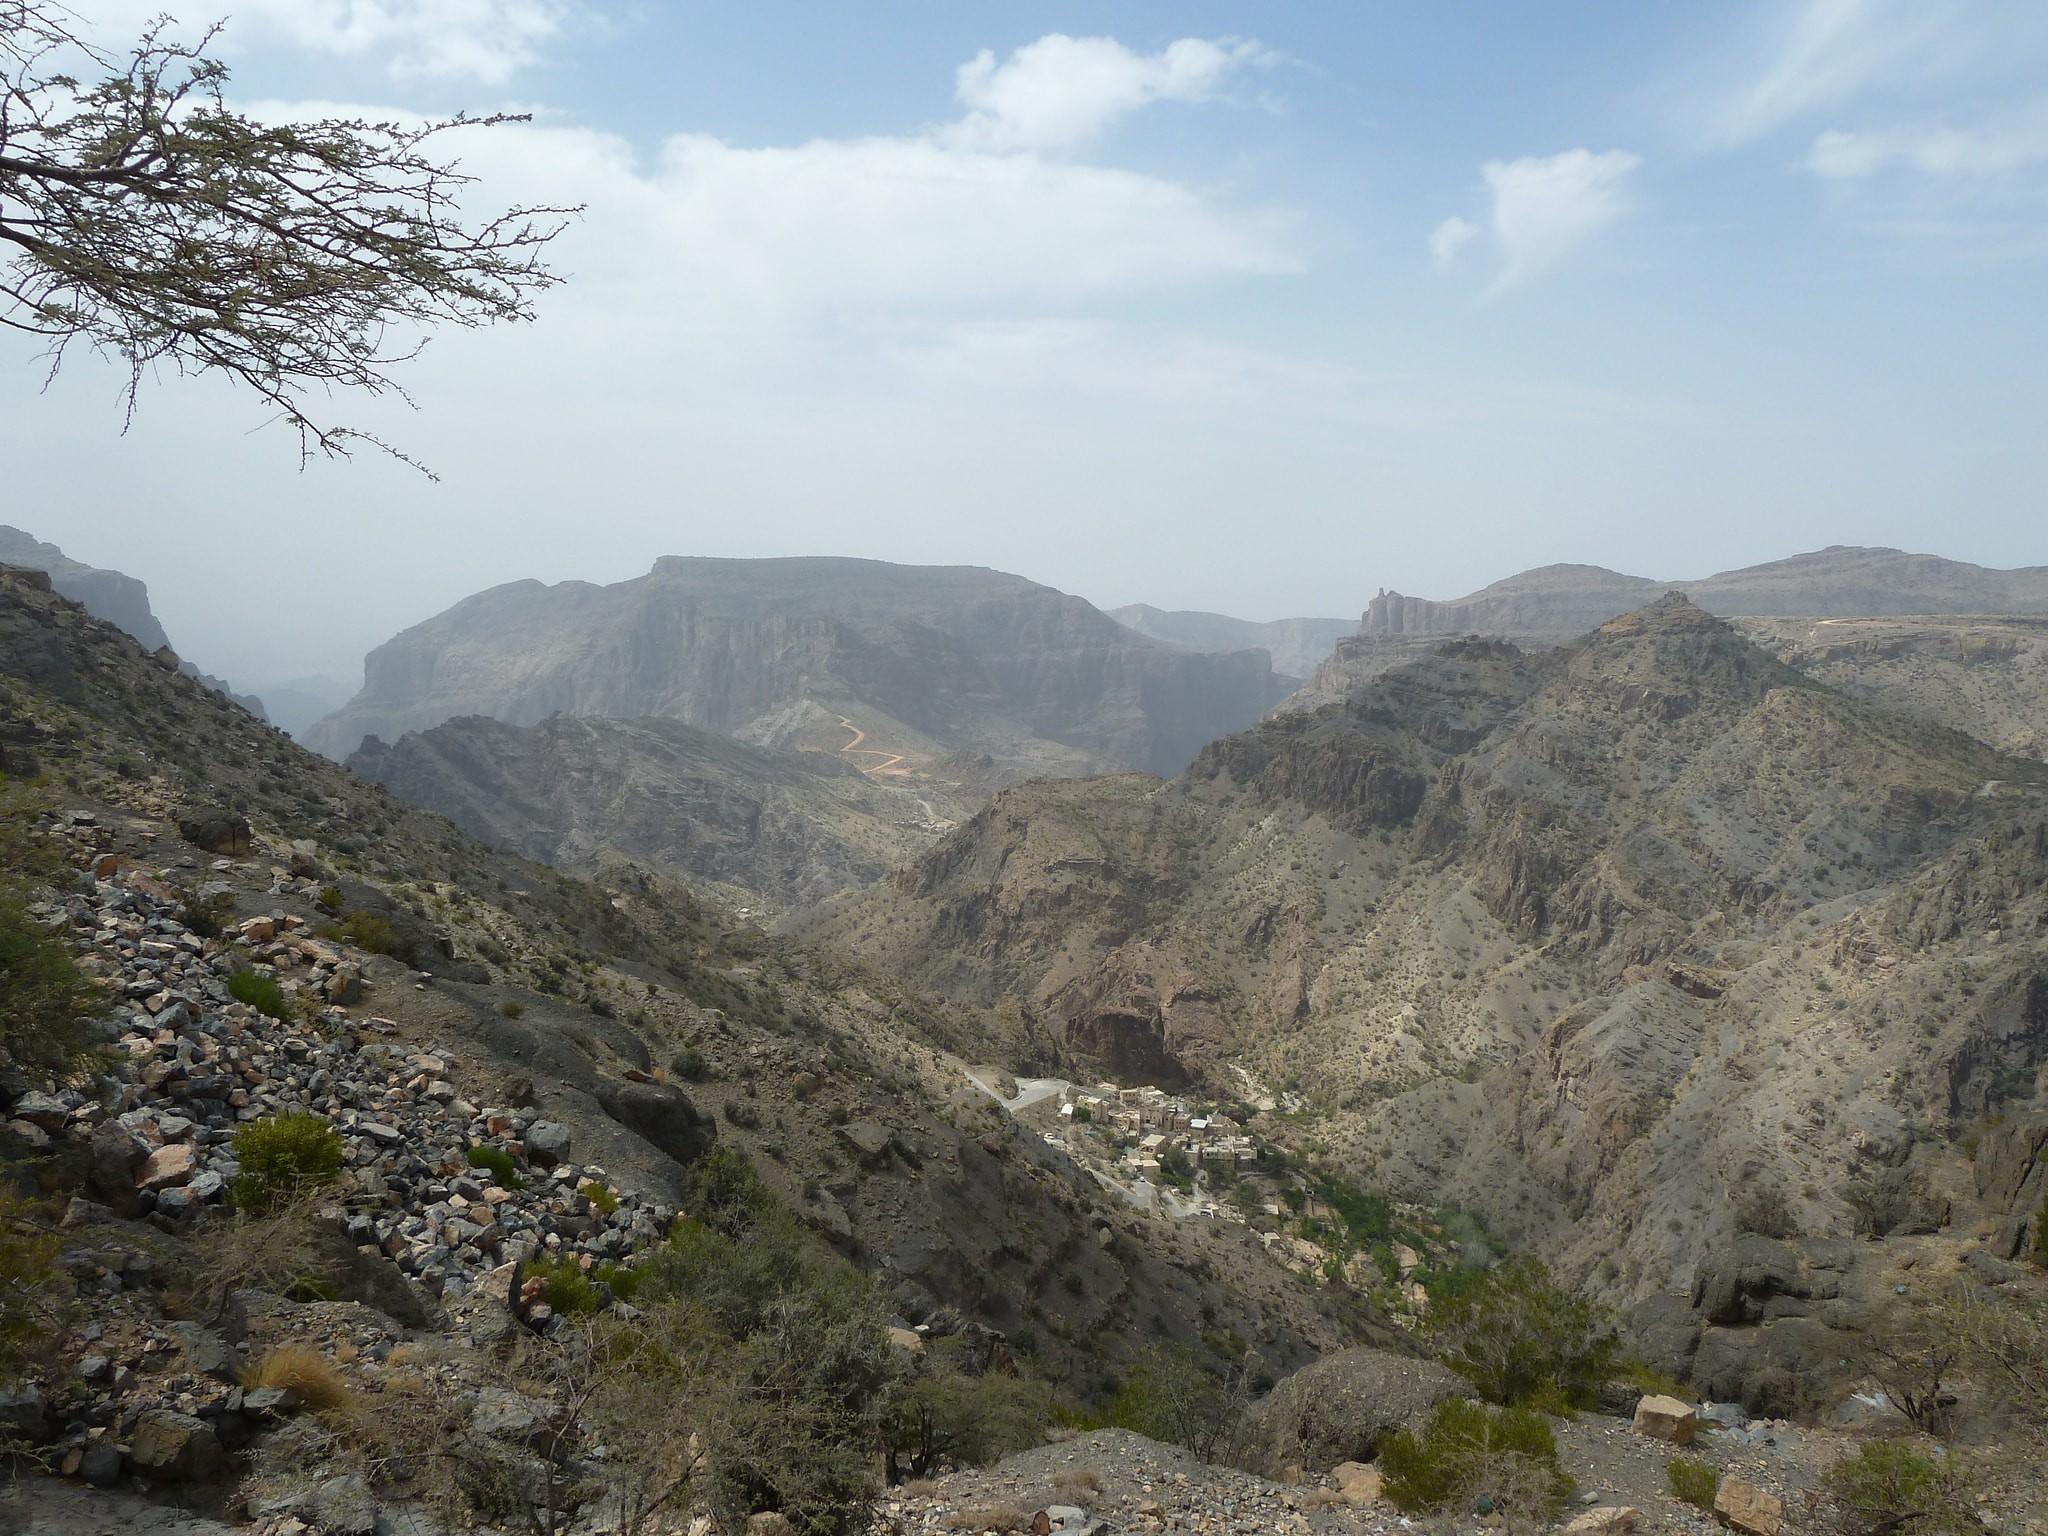 Al Hajar Mountains